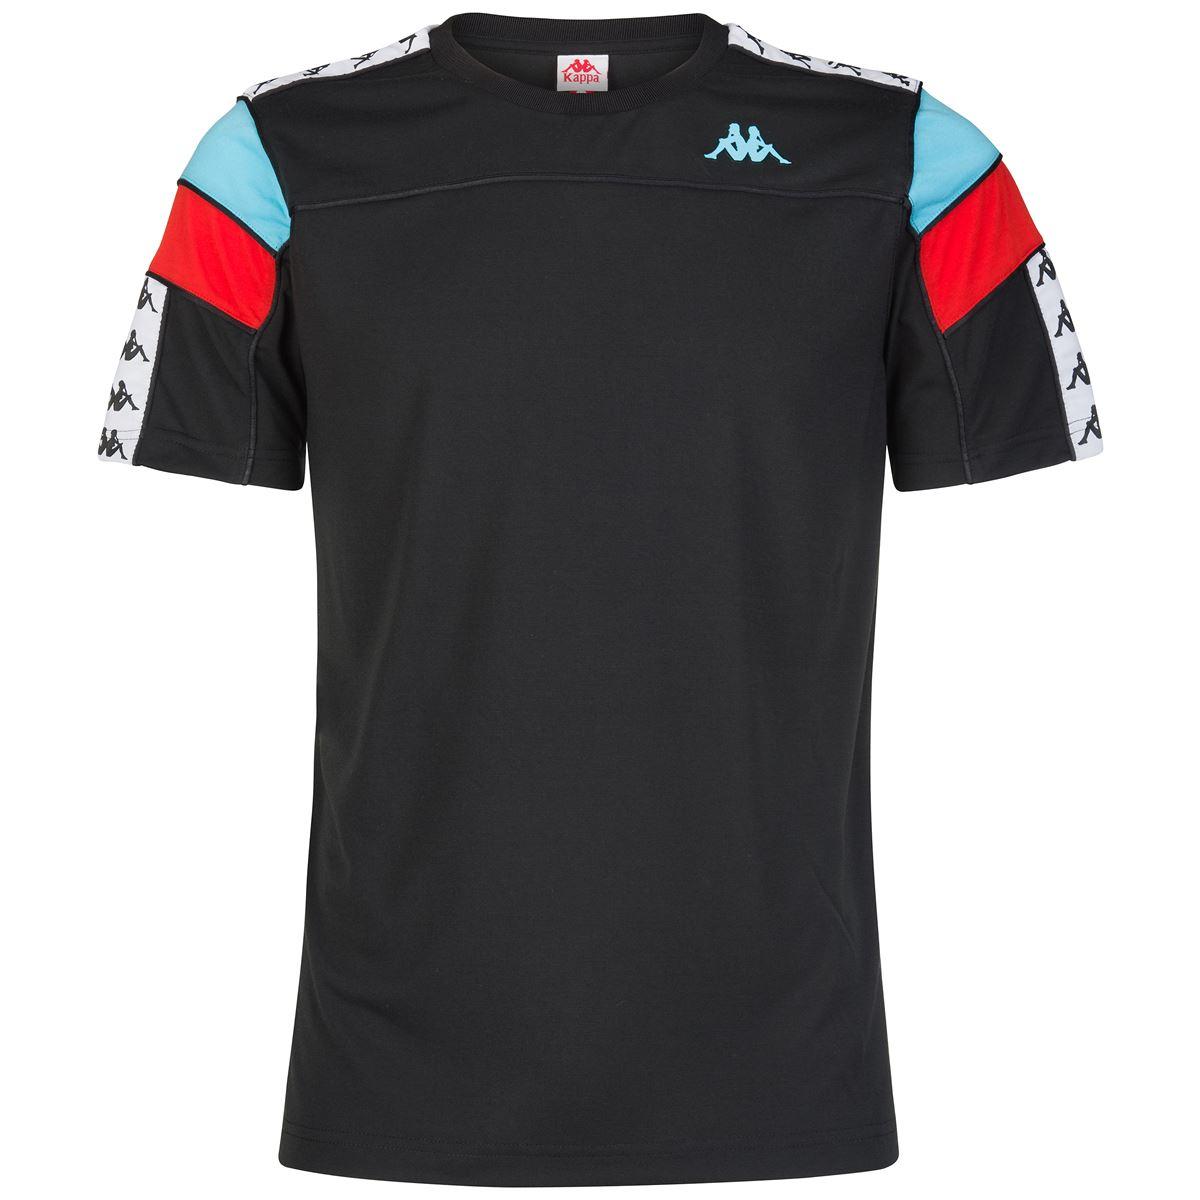 T-SHIRT KAPPA KAPPA | T-shirt m/m | 303WBS0A6C